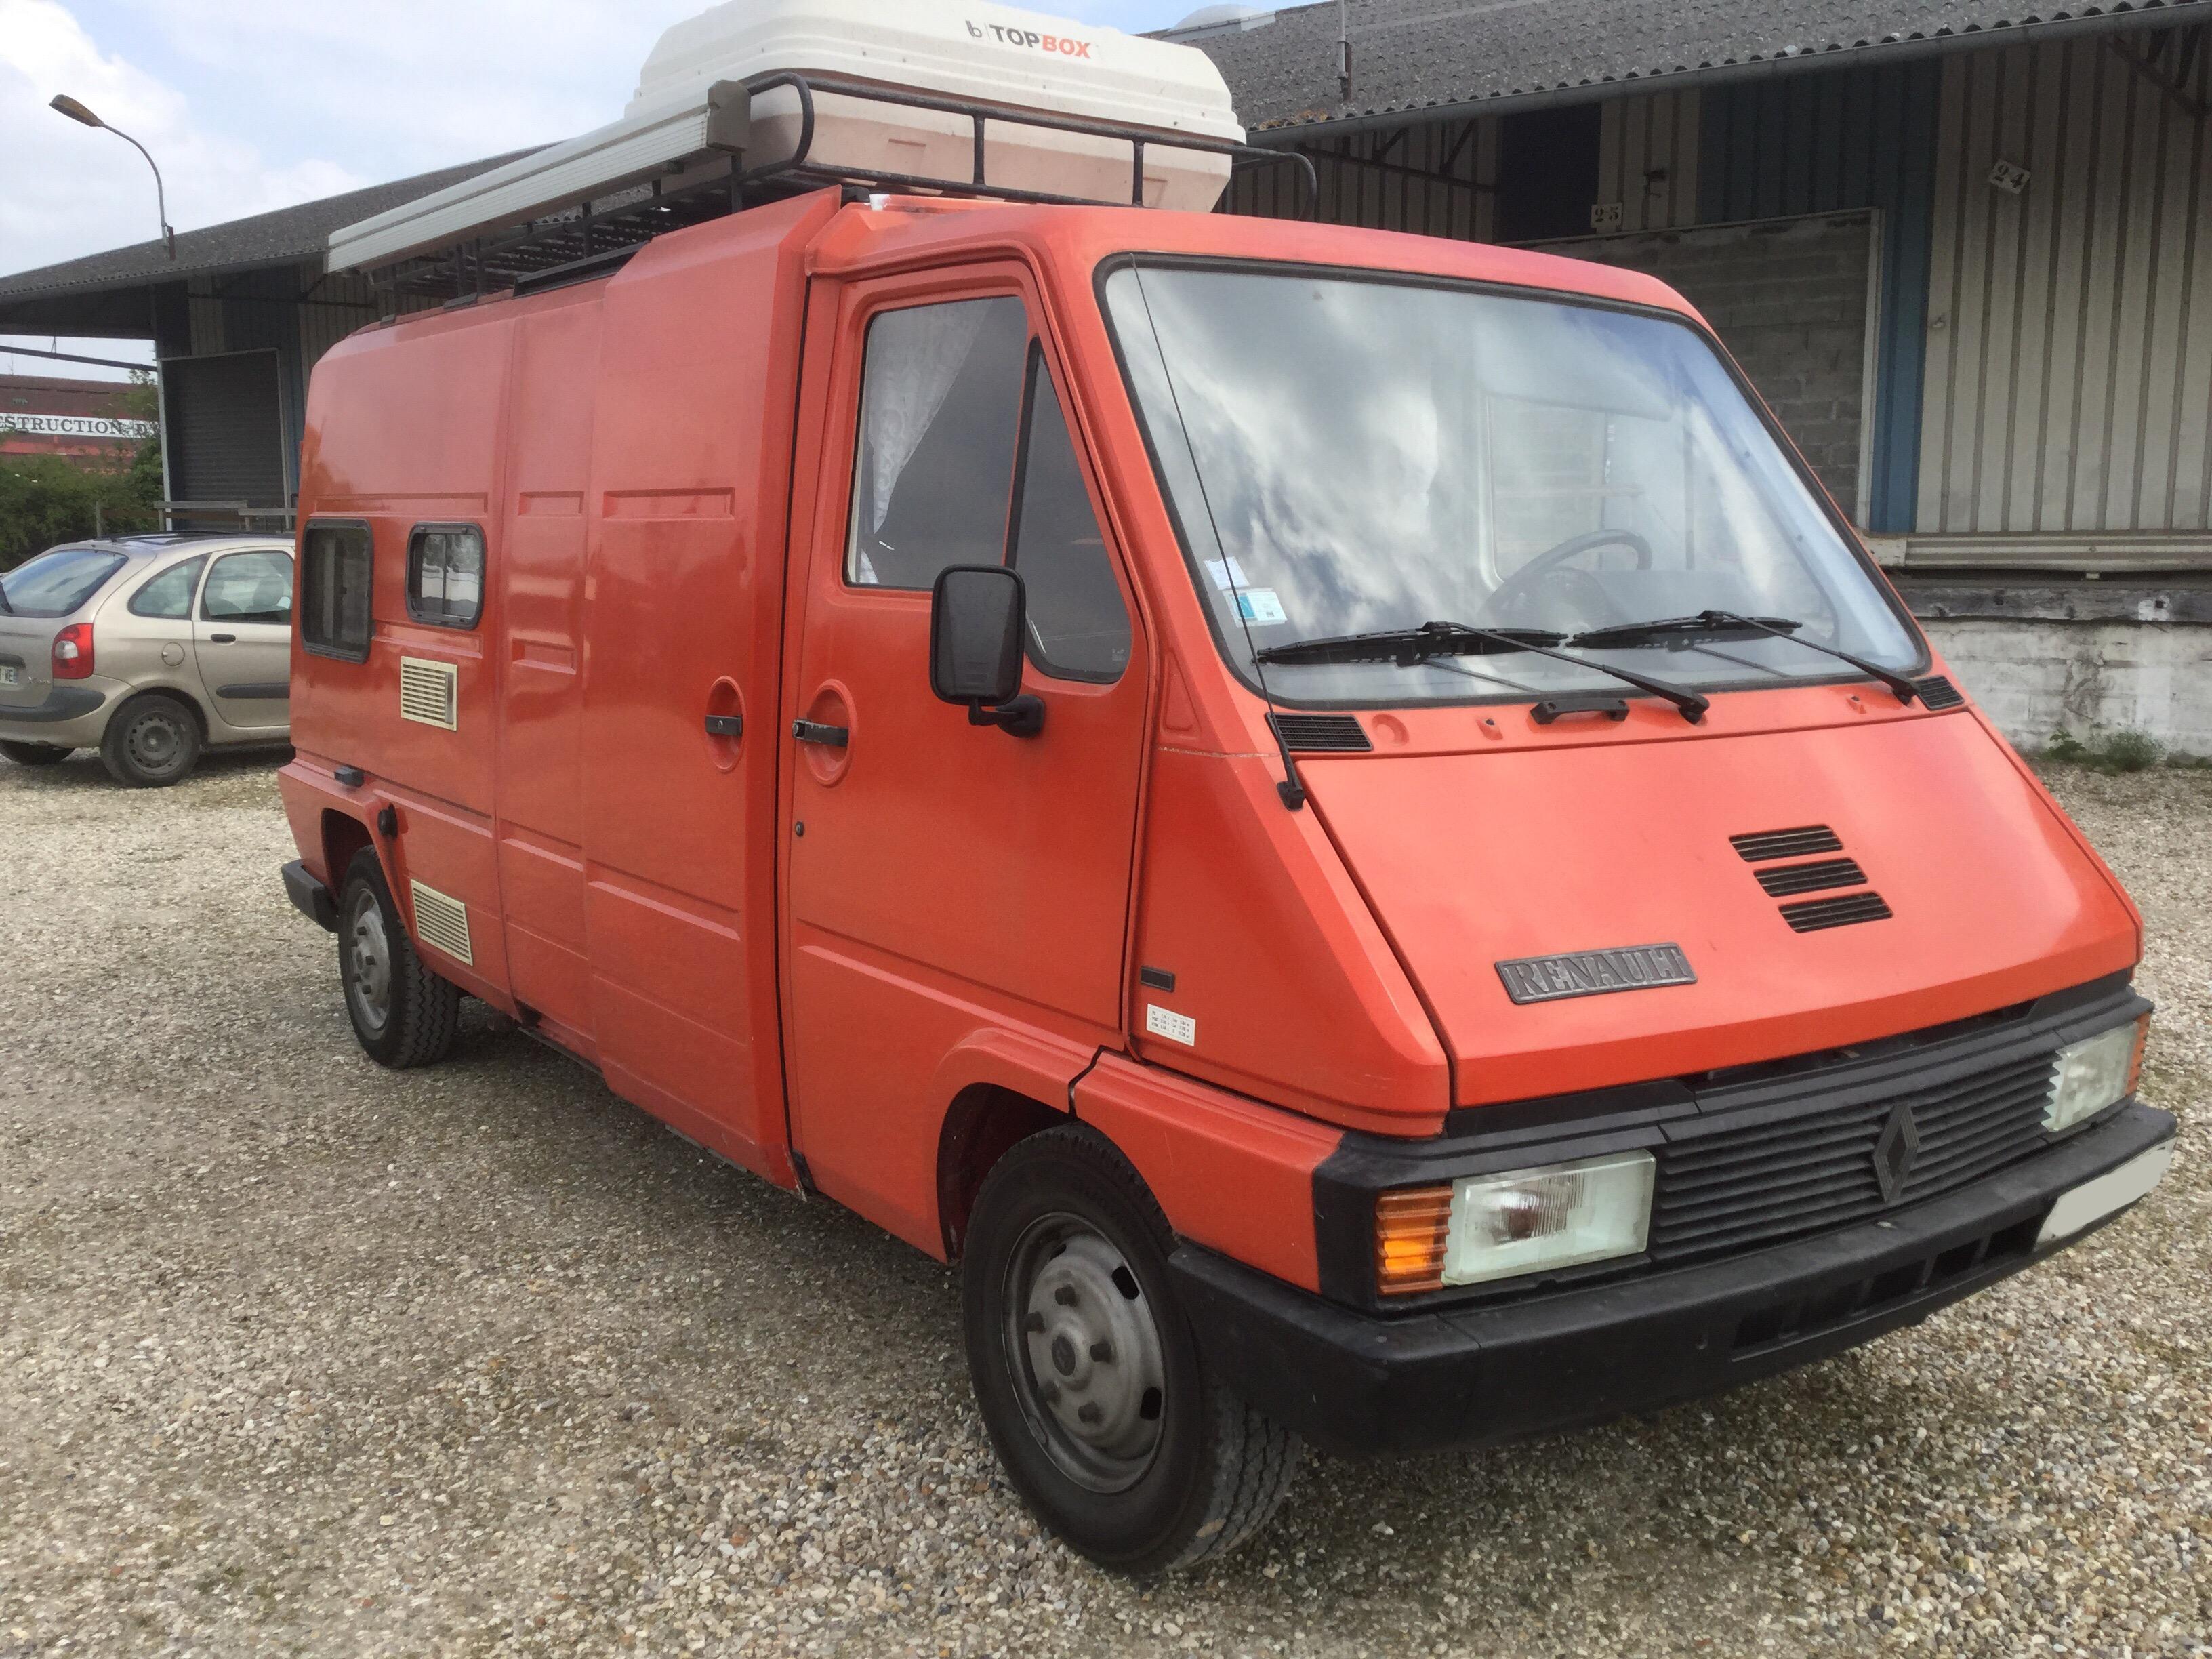 renault master occasion de 1988 renault camping car en vente aubevoye eure 27. Black Bedroom Furniture Sets. Home Design Ideas